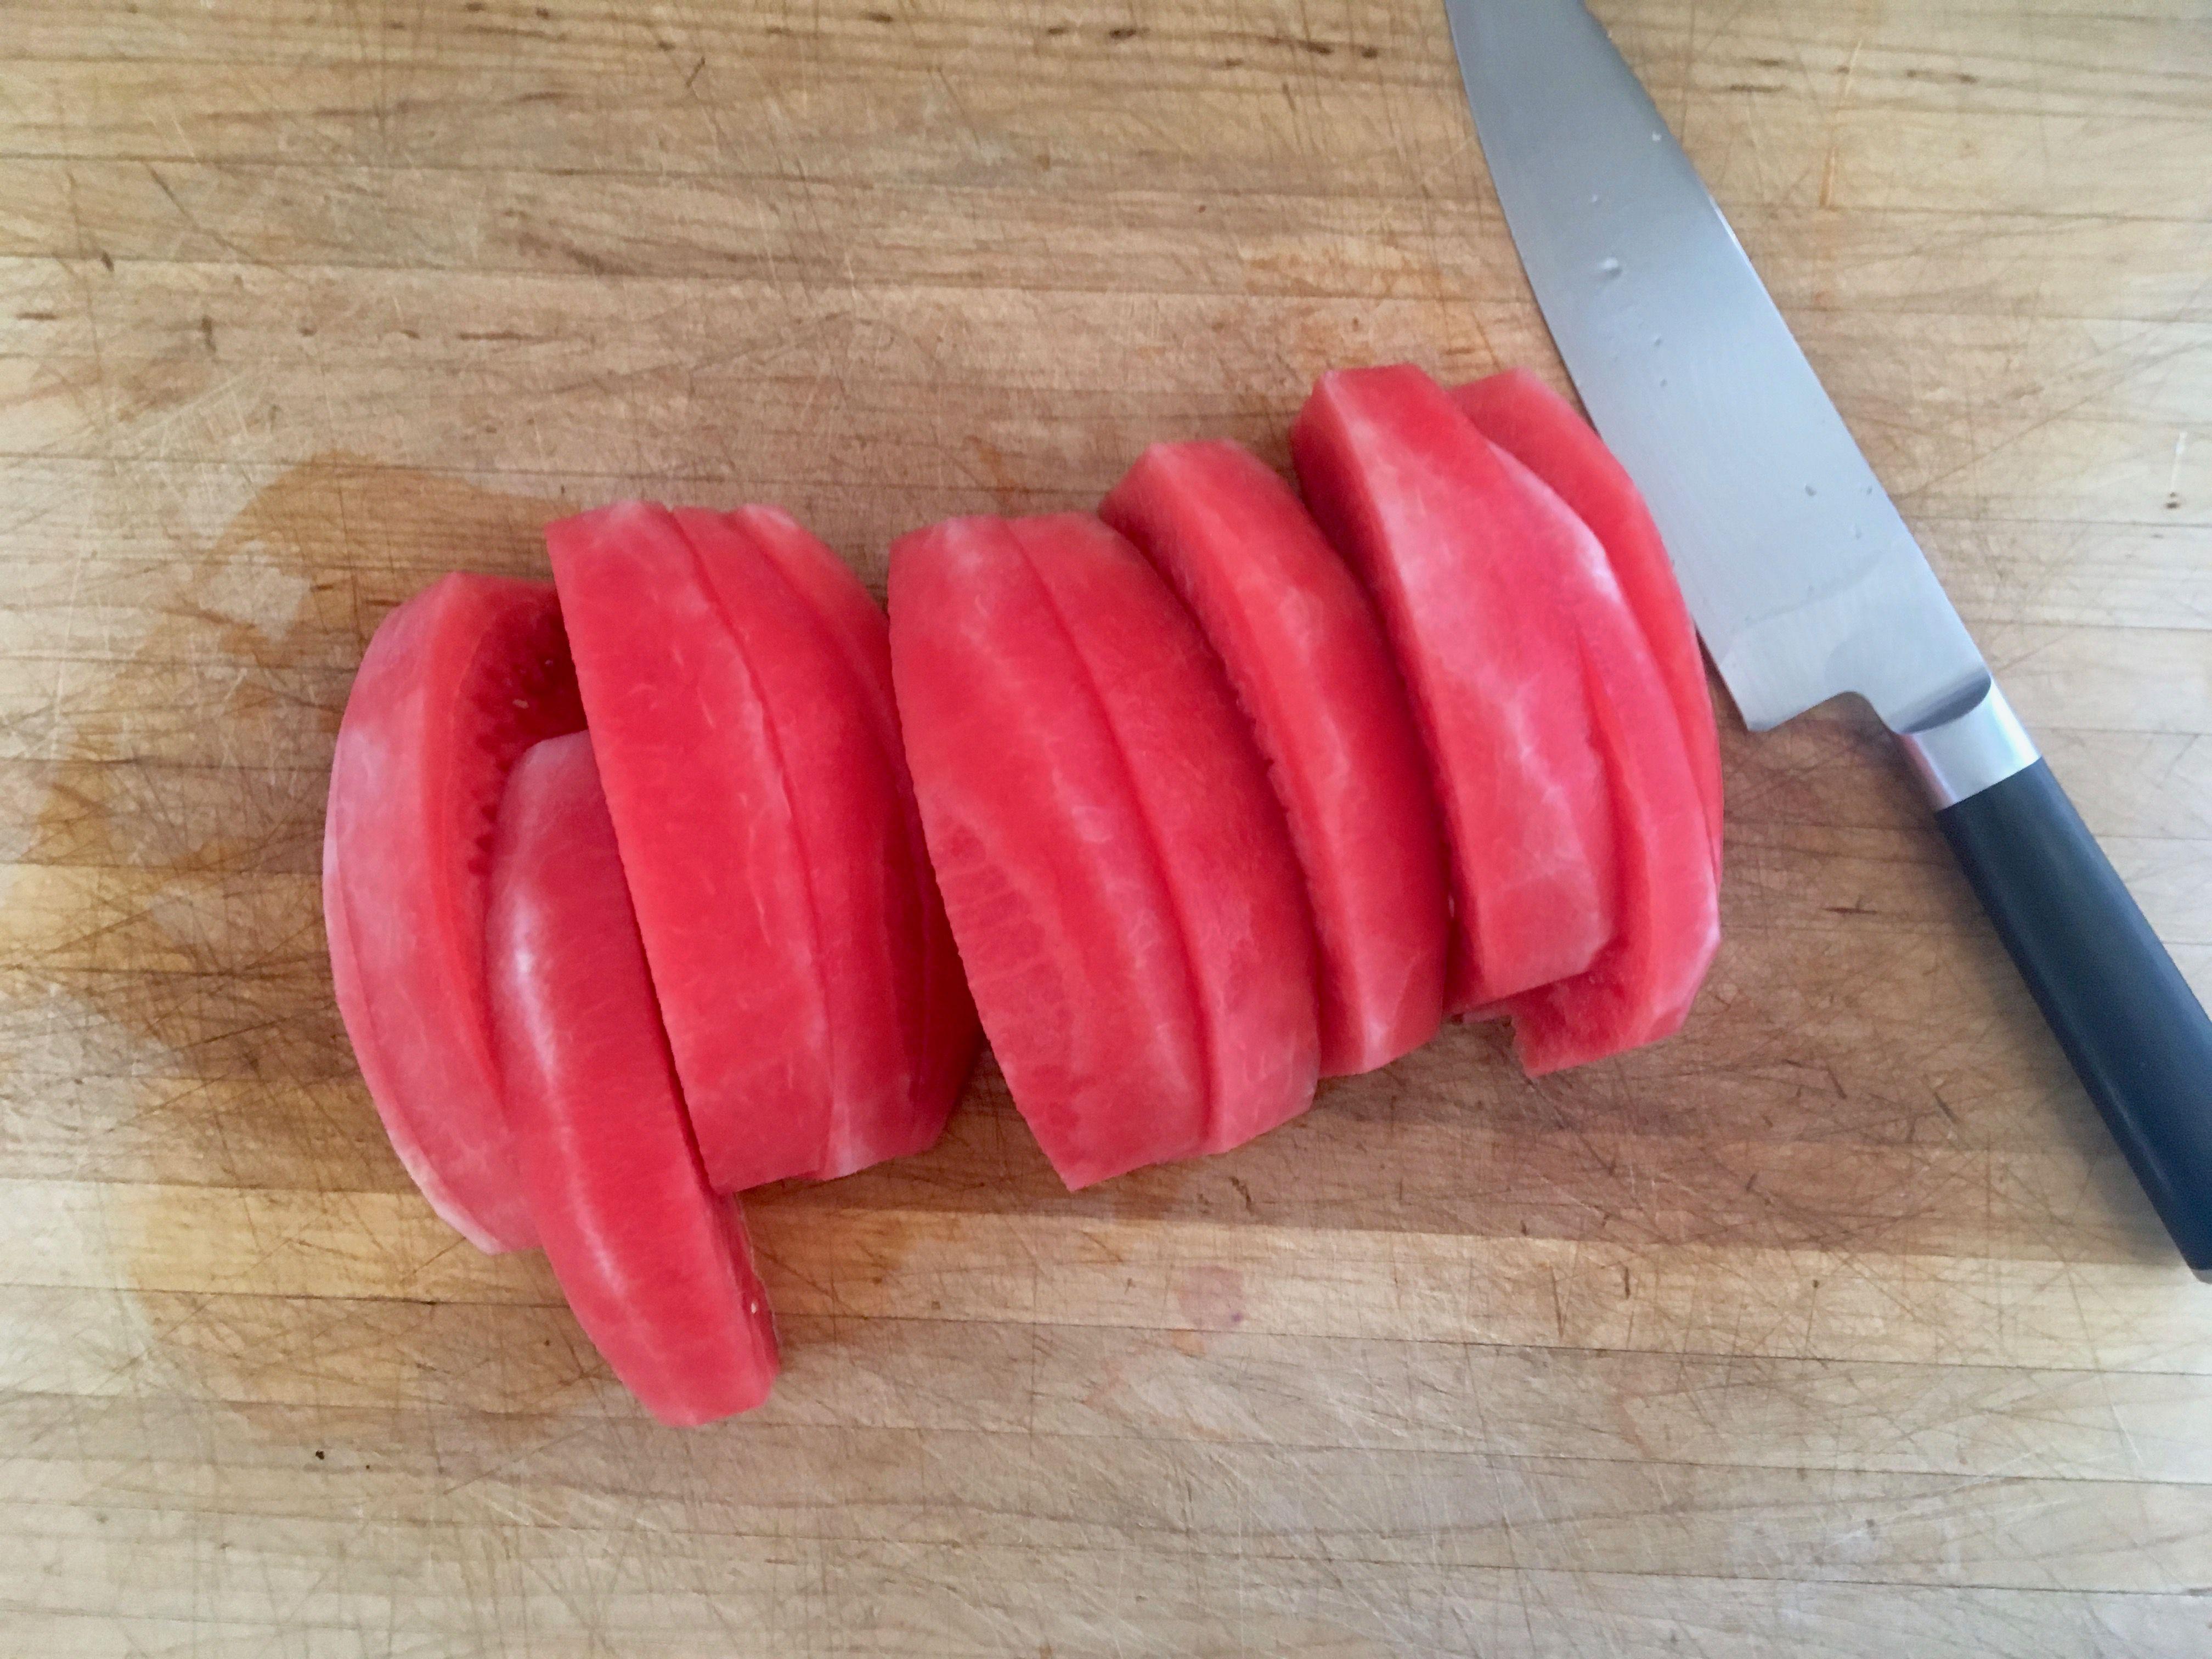 Peeled Melon